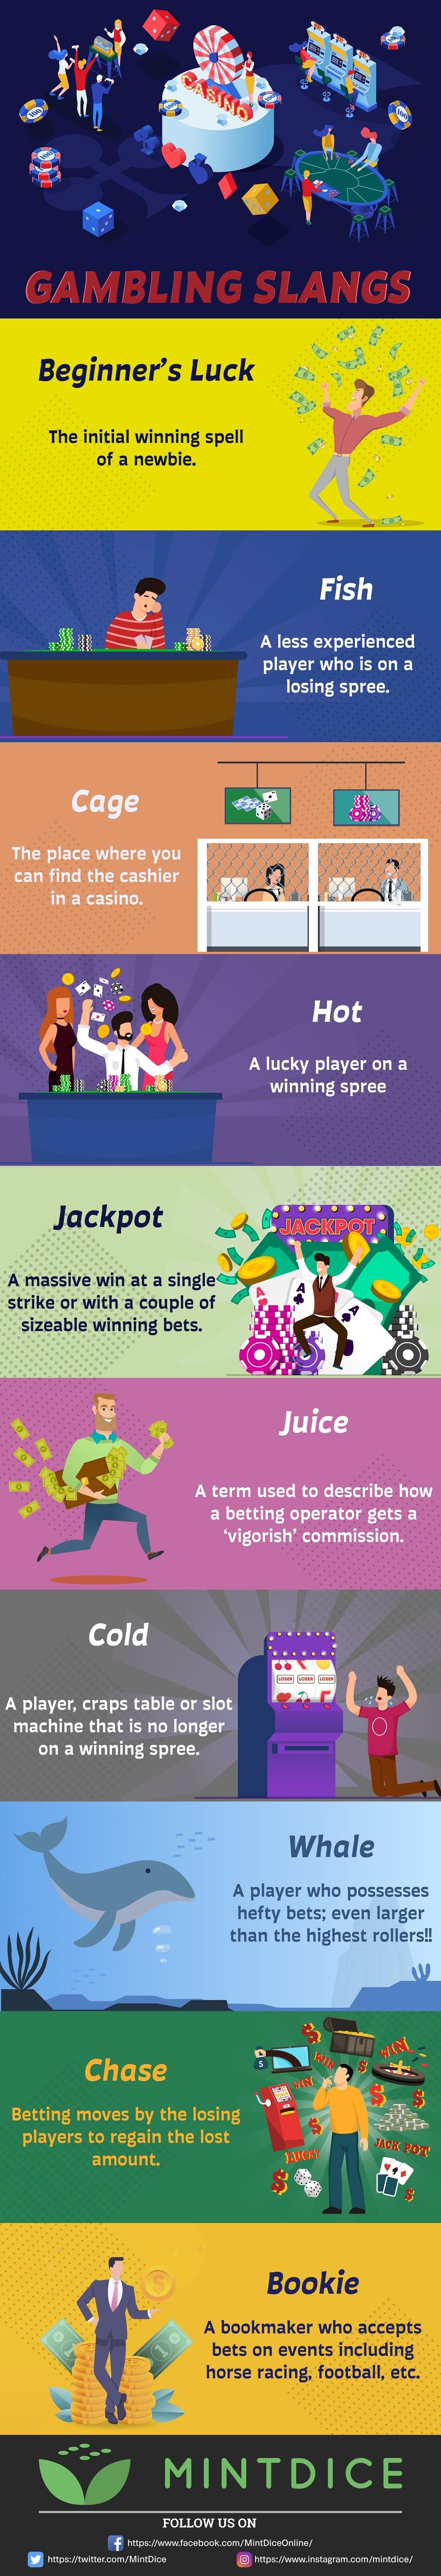 Bitcoin Gambling Slang #infographic